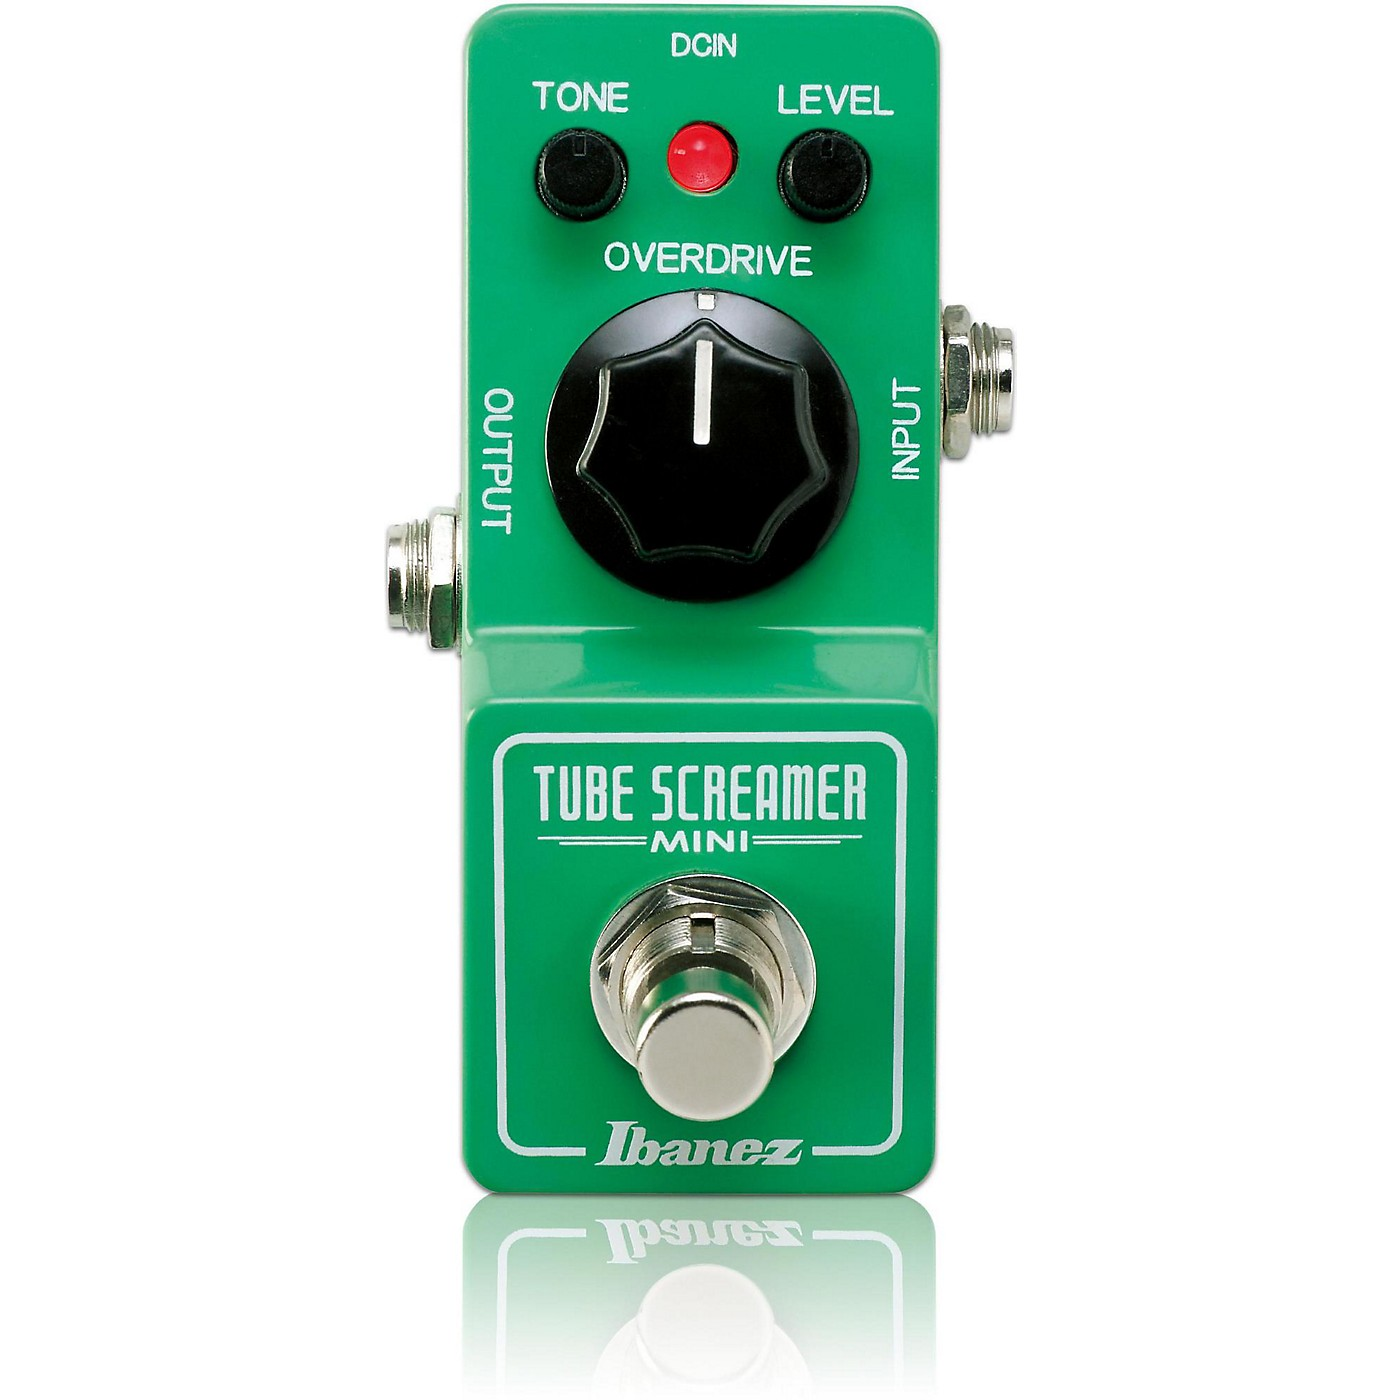 Ibanez Tube Screamer Mini Guitar Effect Pedal thumbnail